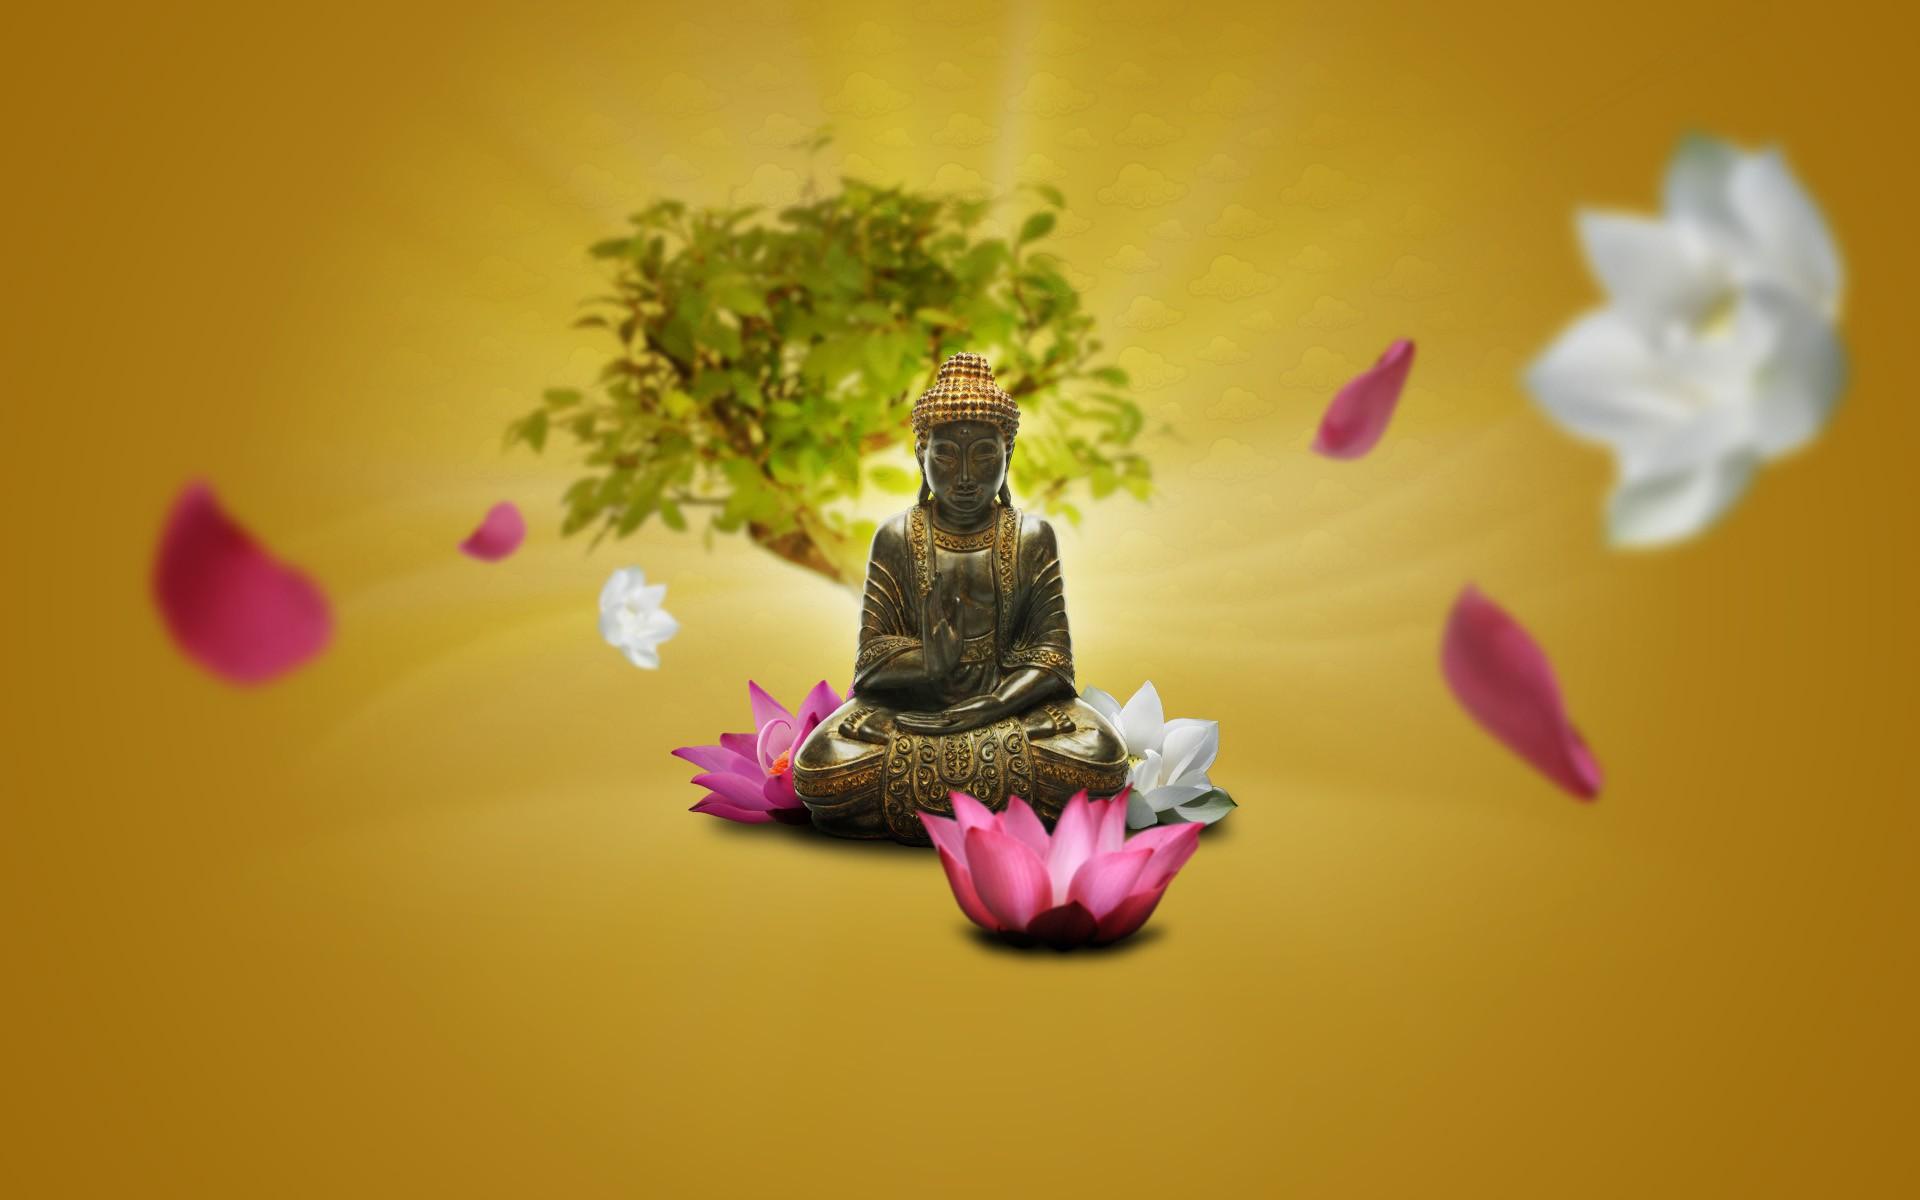 Green Yellow Pink Lotus Flowers Meditation Buddha Zen ART Color Flower Plant Flora Petal Macro Photography